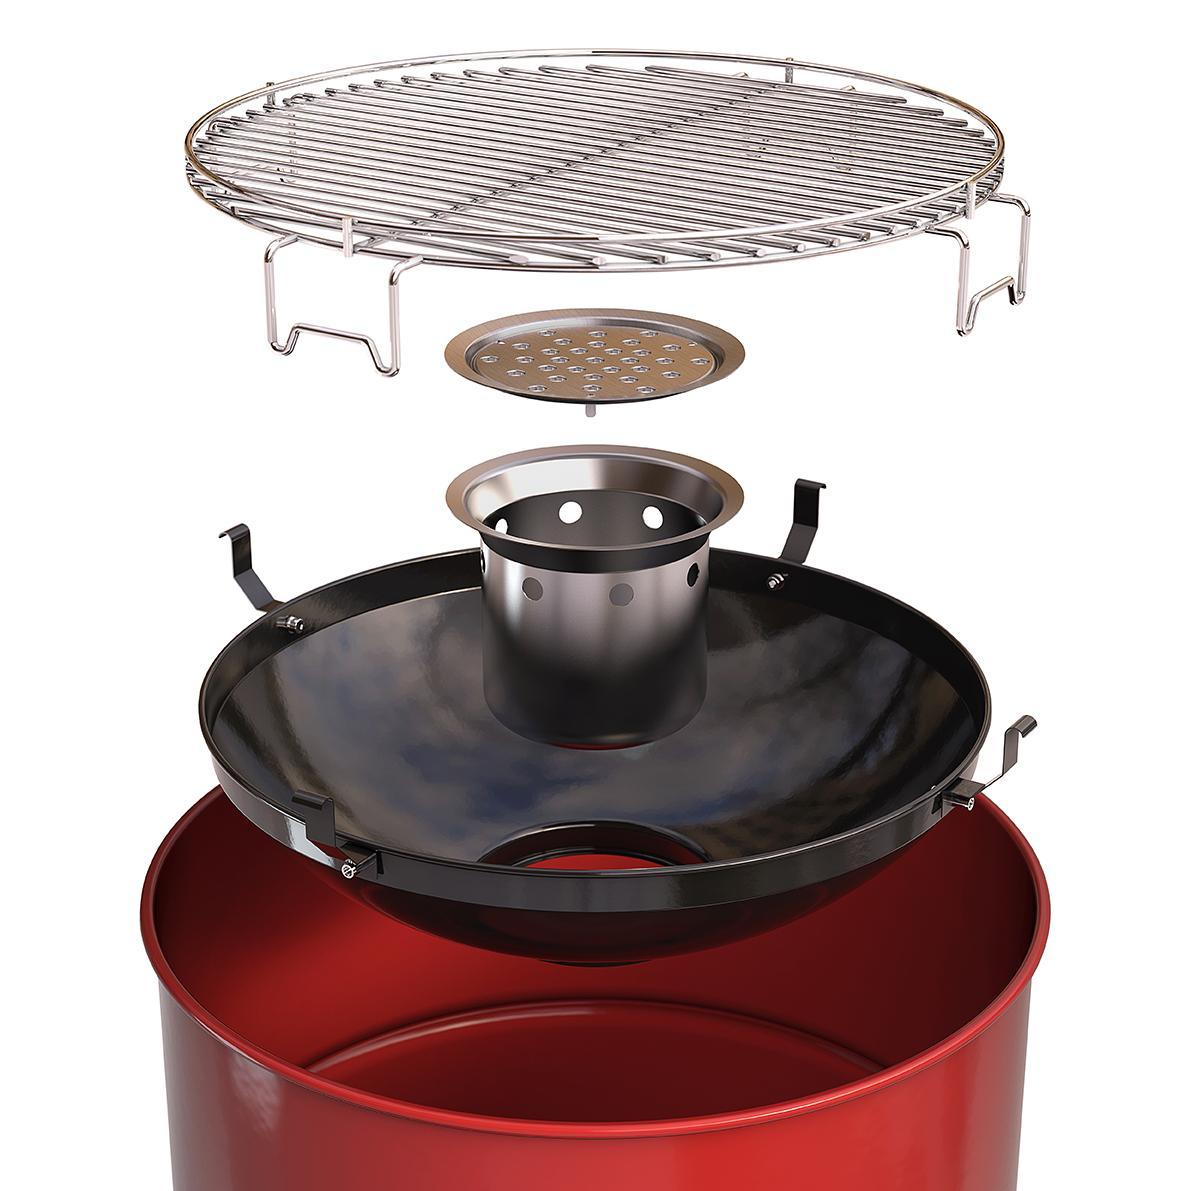 barbecook Holzkohlegrill, Edson, schwarz, 60 x 60 x 89 cm